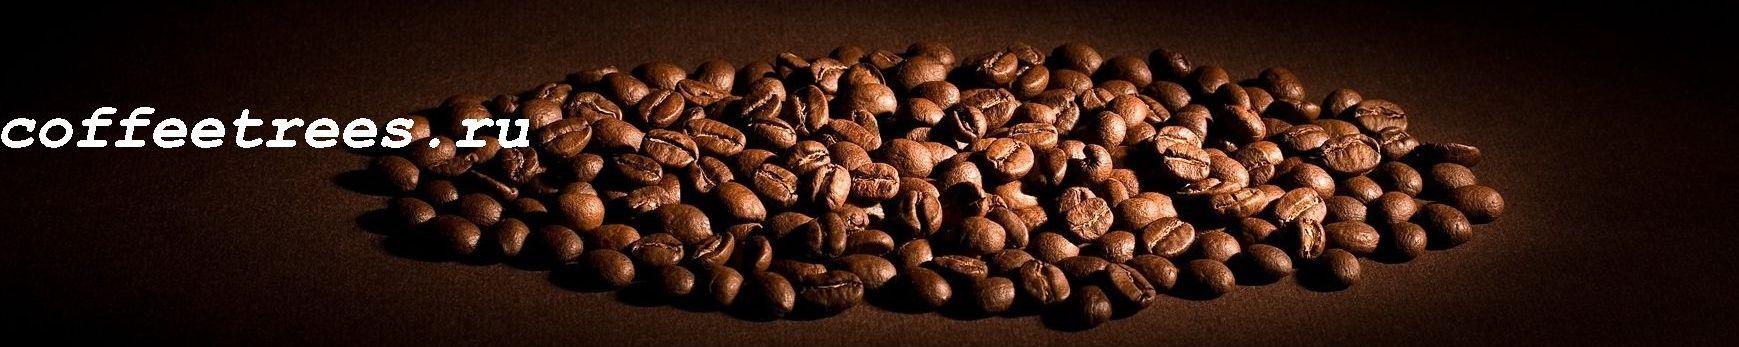 coffeetrees.ru